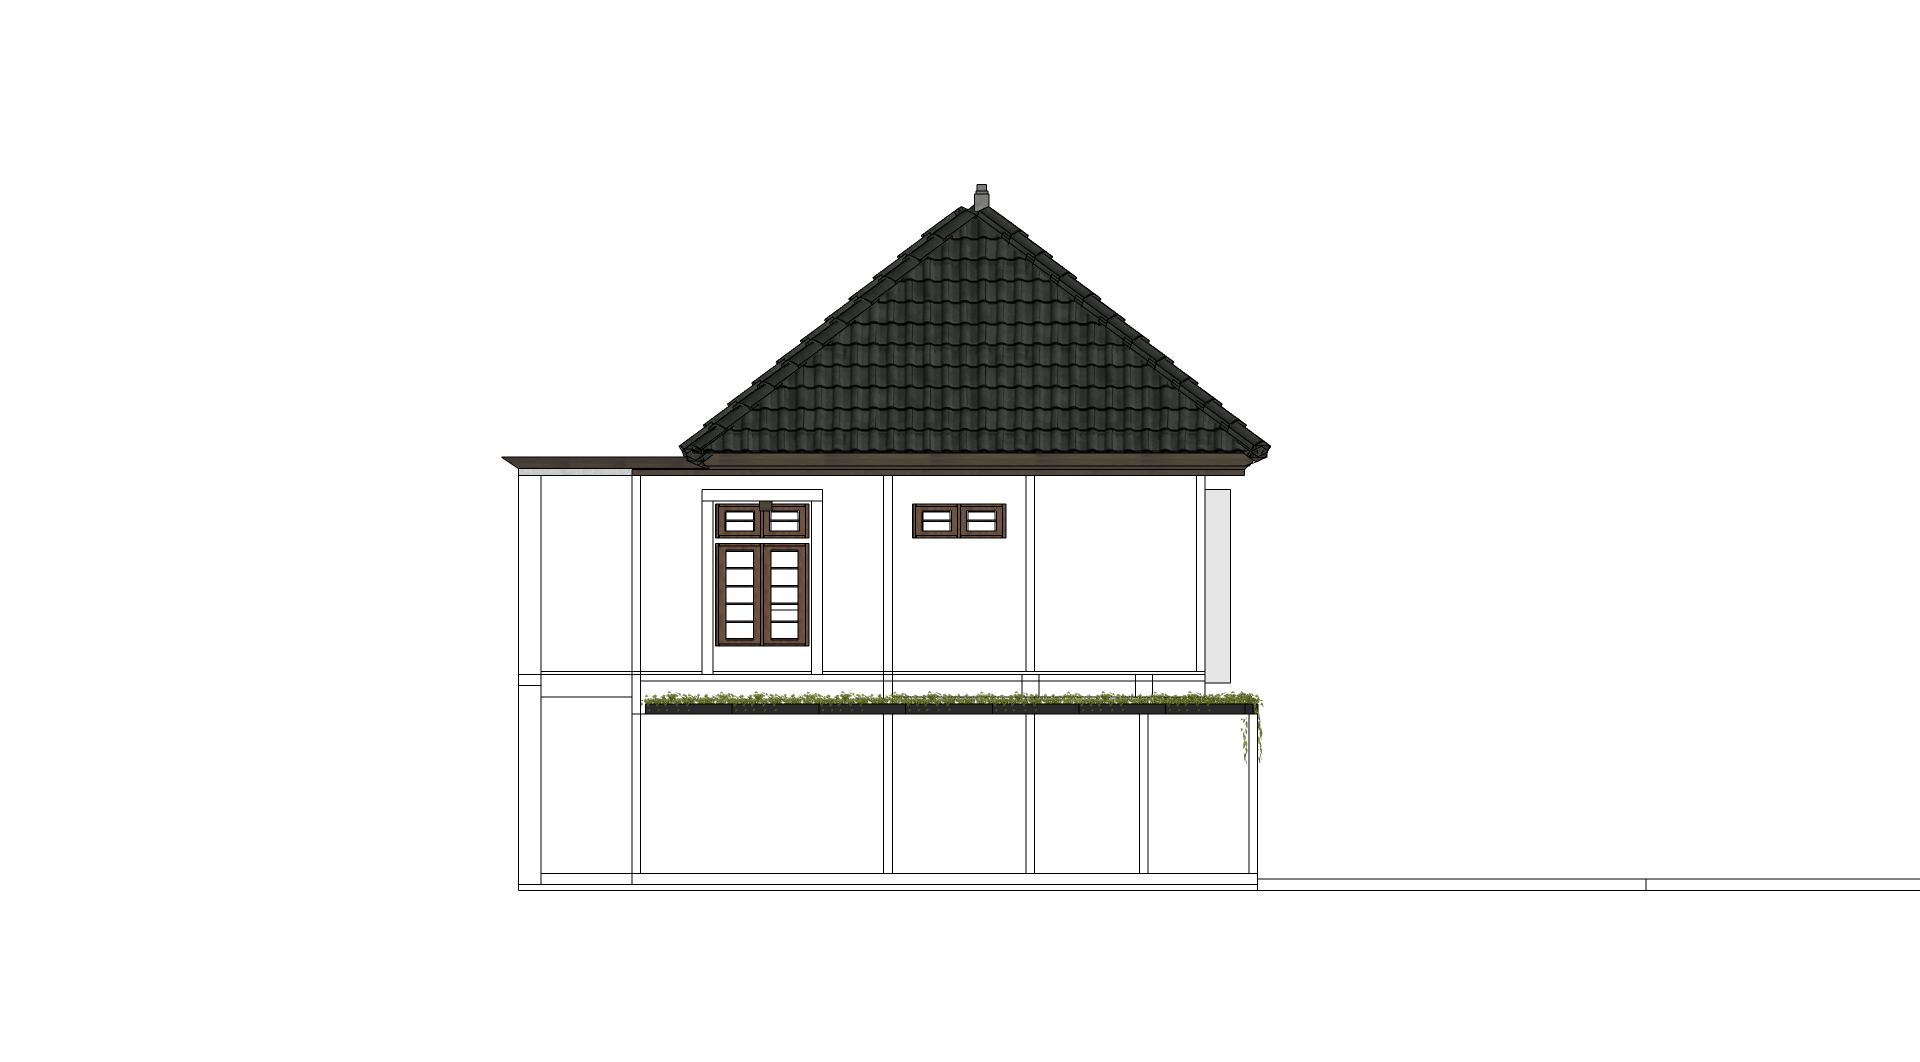 Astabumi Studio Js House Timor Leste Dili, Timor-Leste Pati, Kec. Pati, Kabupaten Pati, Jawa Tengah, Indonesia Cv-Astabumi-Manunggal-Prakarsa-Js-House-Timor-Leste   119270